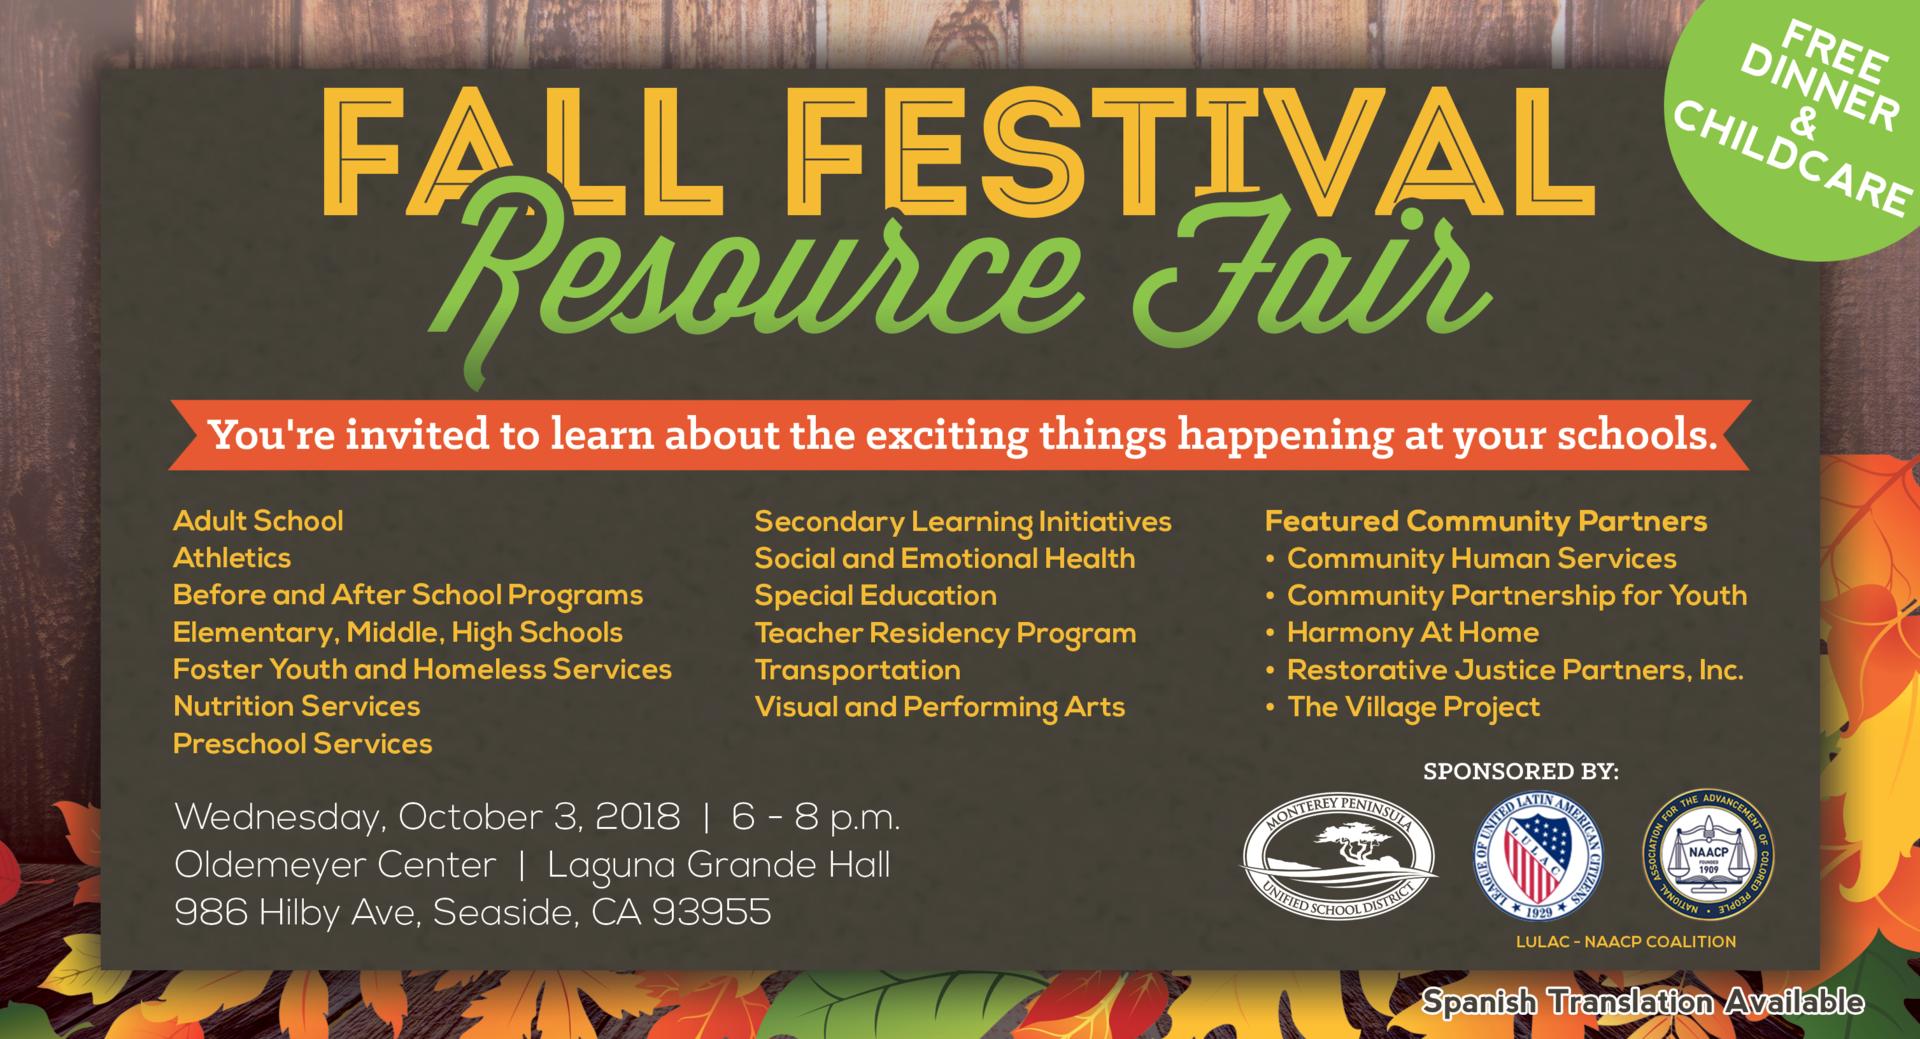 MPUSD Fall Festival Resource Fair Flyer